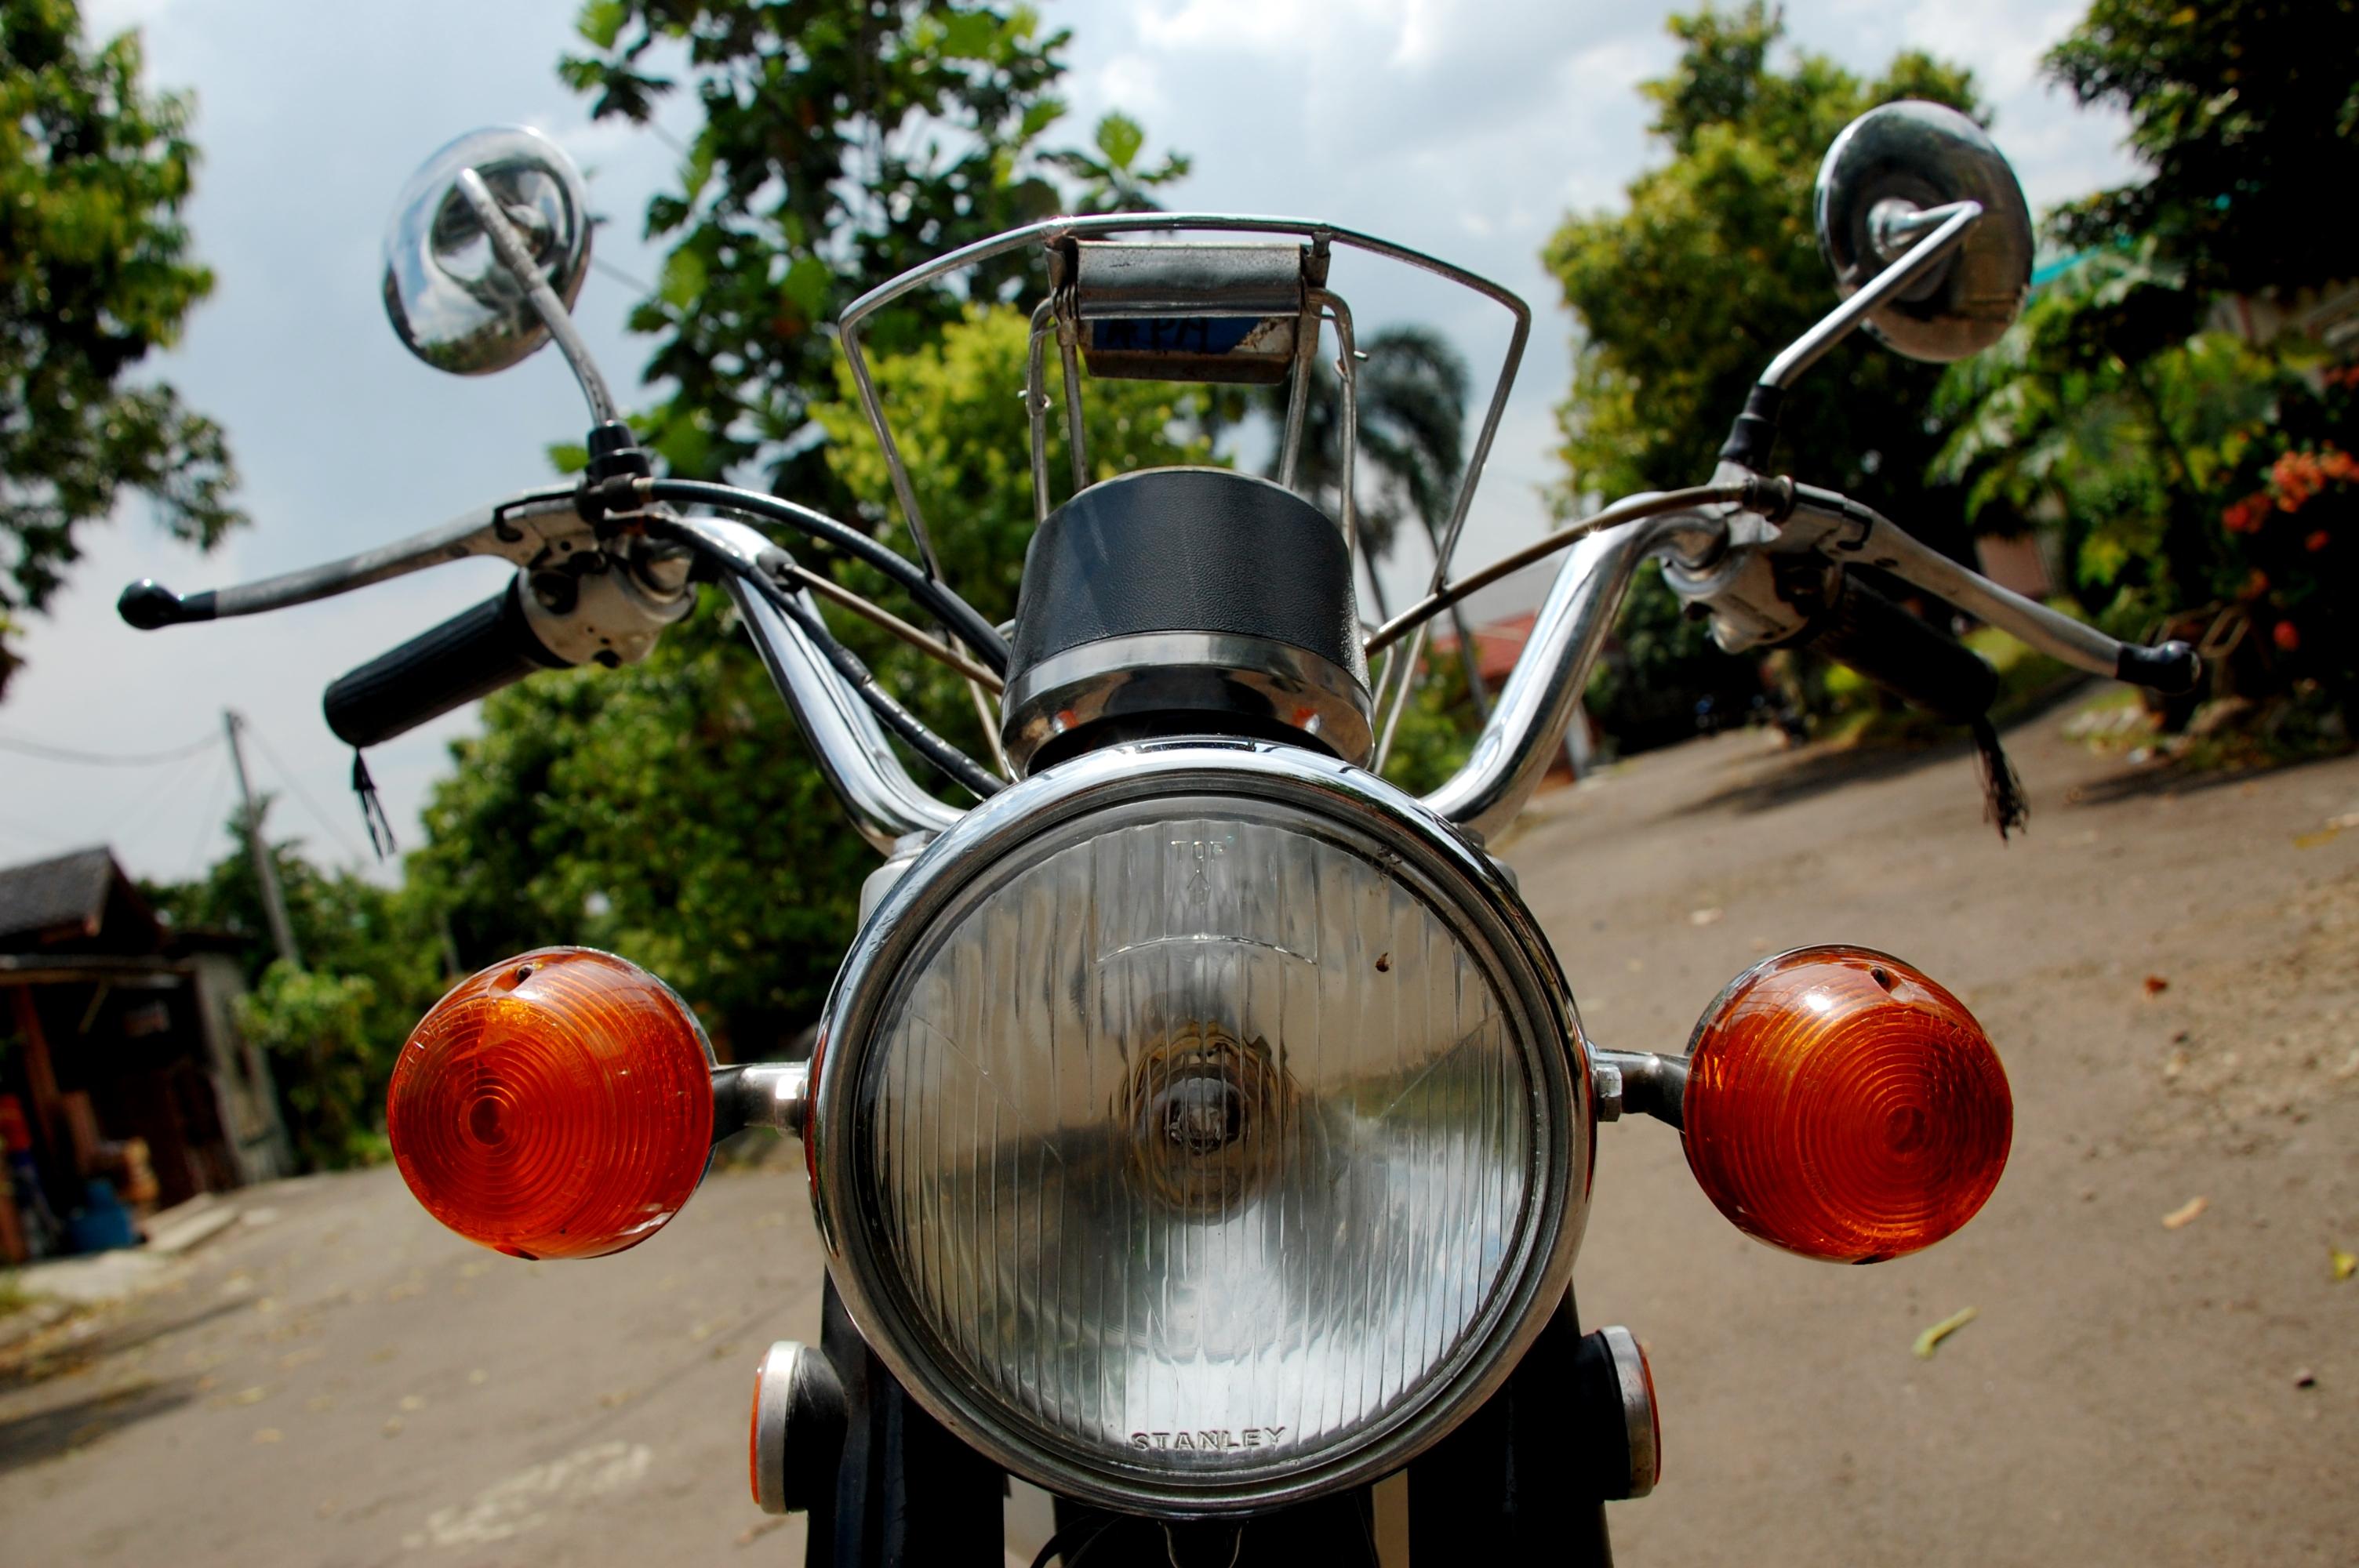 Taufik Honda Cb 100 The Everlasting Bike Gilamotor